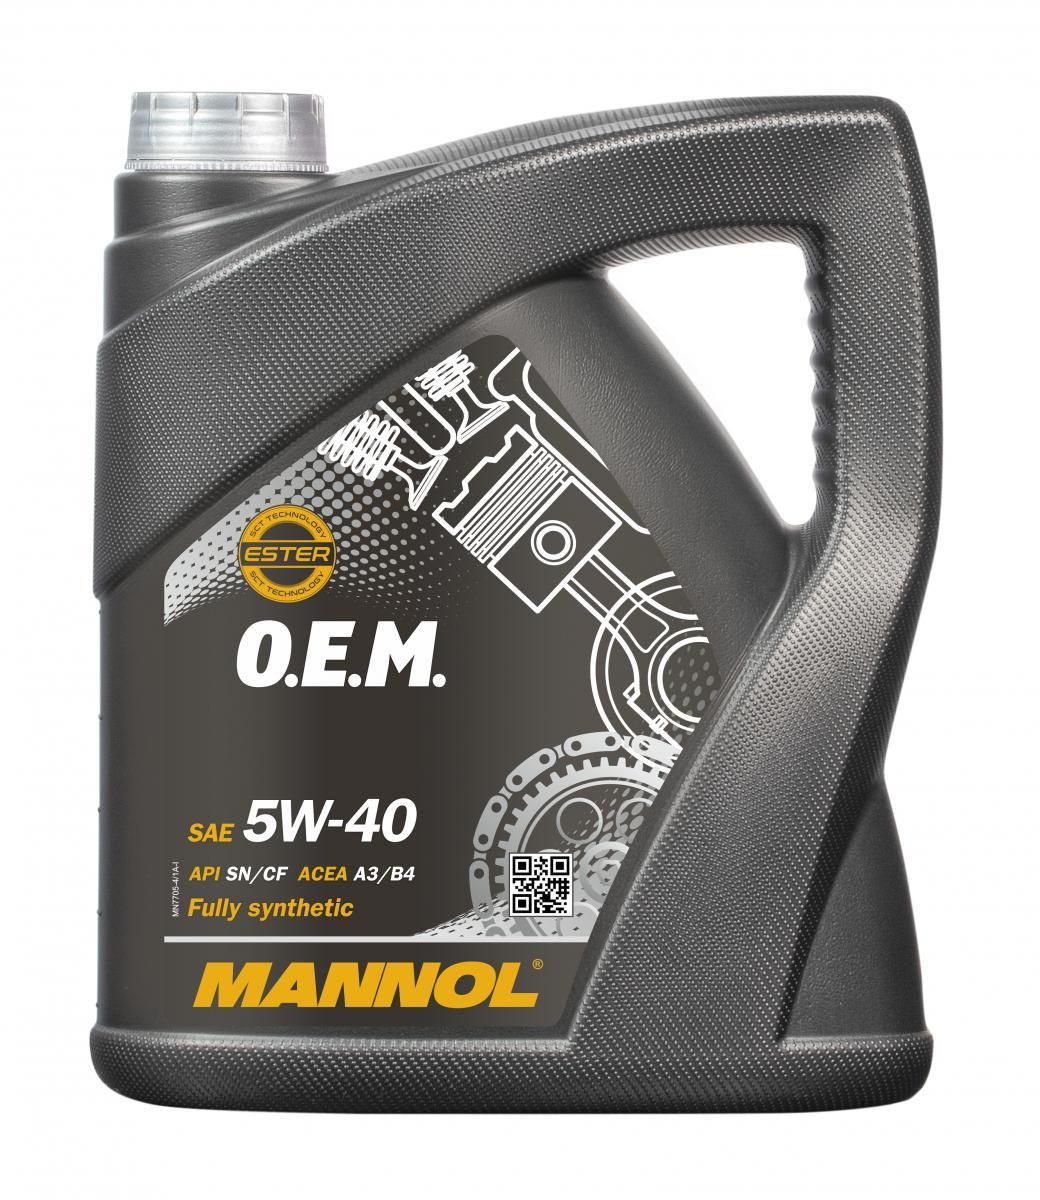 MANNOL O.E.M. MN7705-4 Motoröl